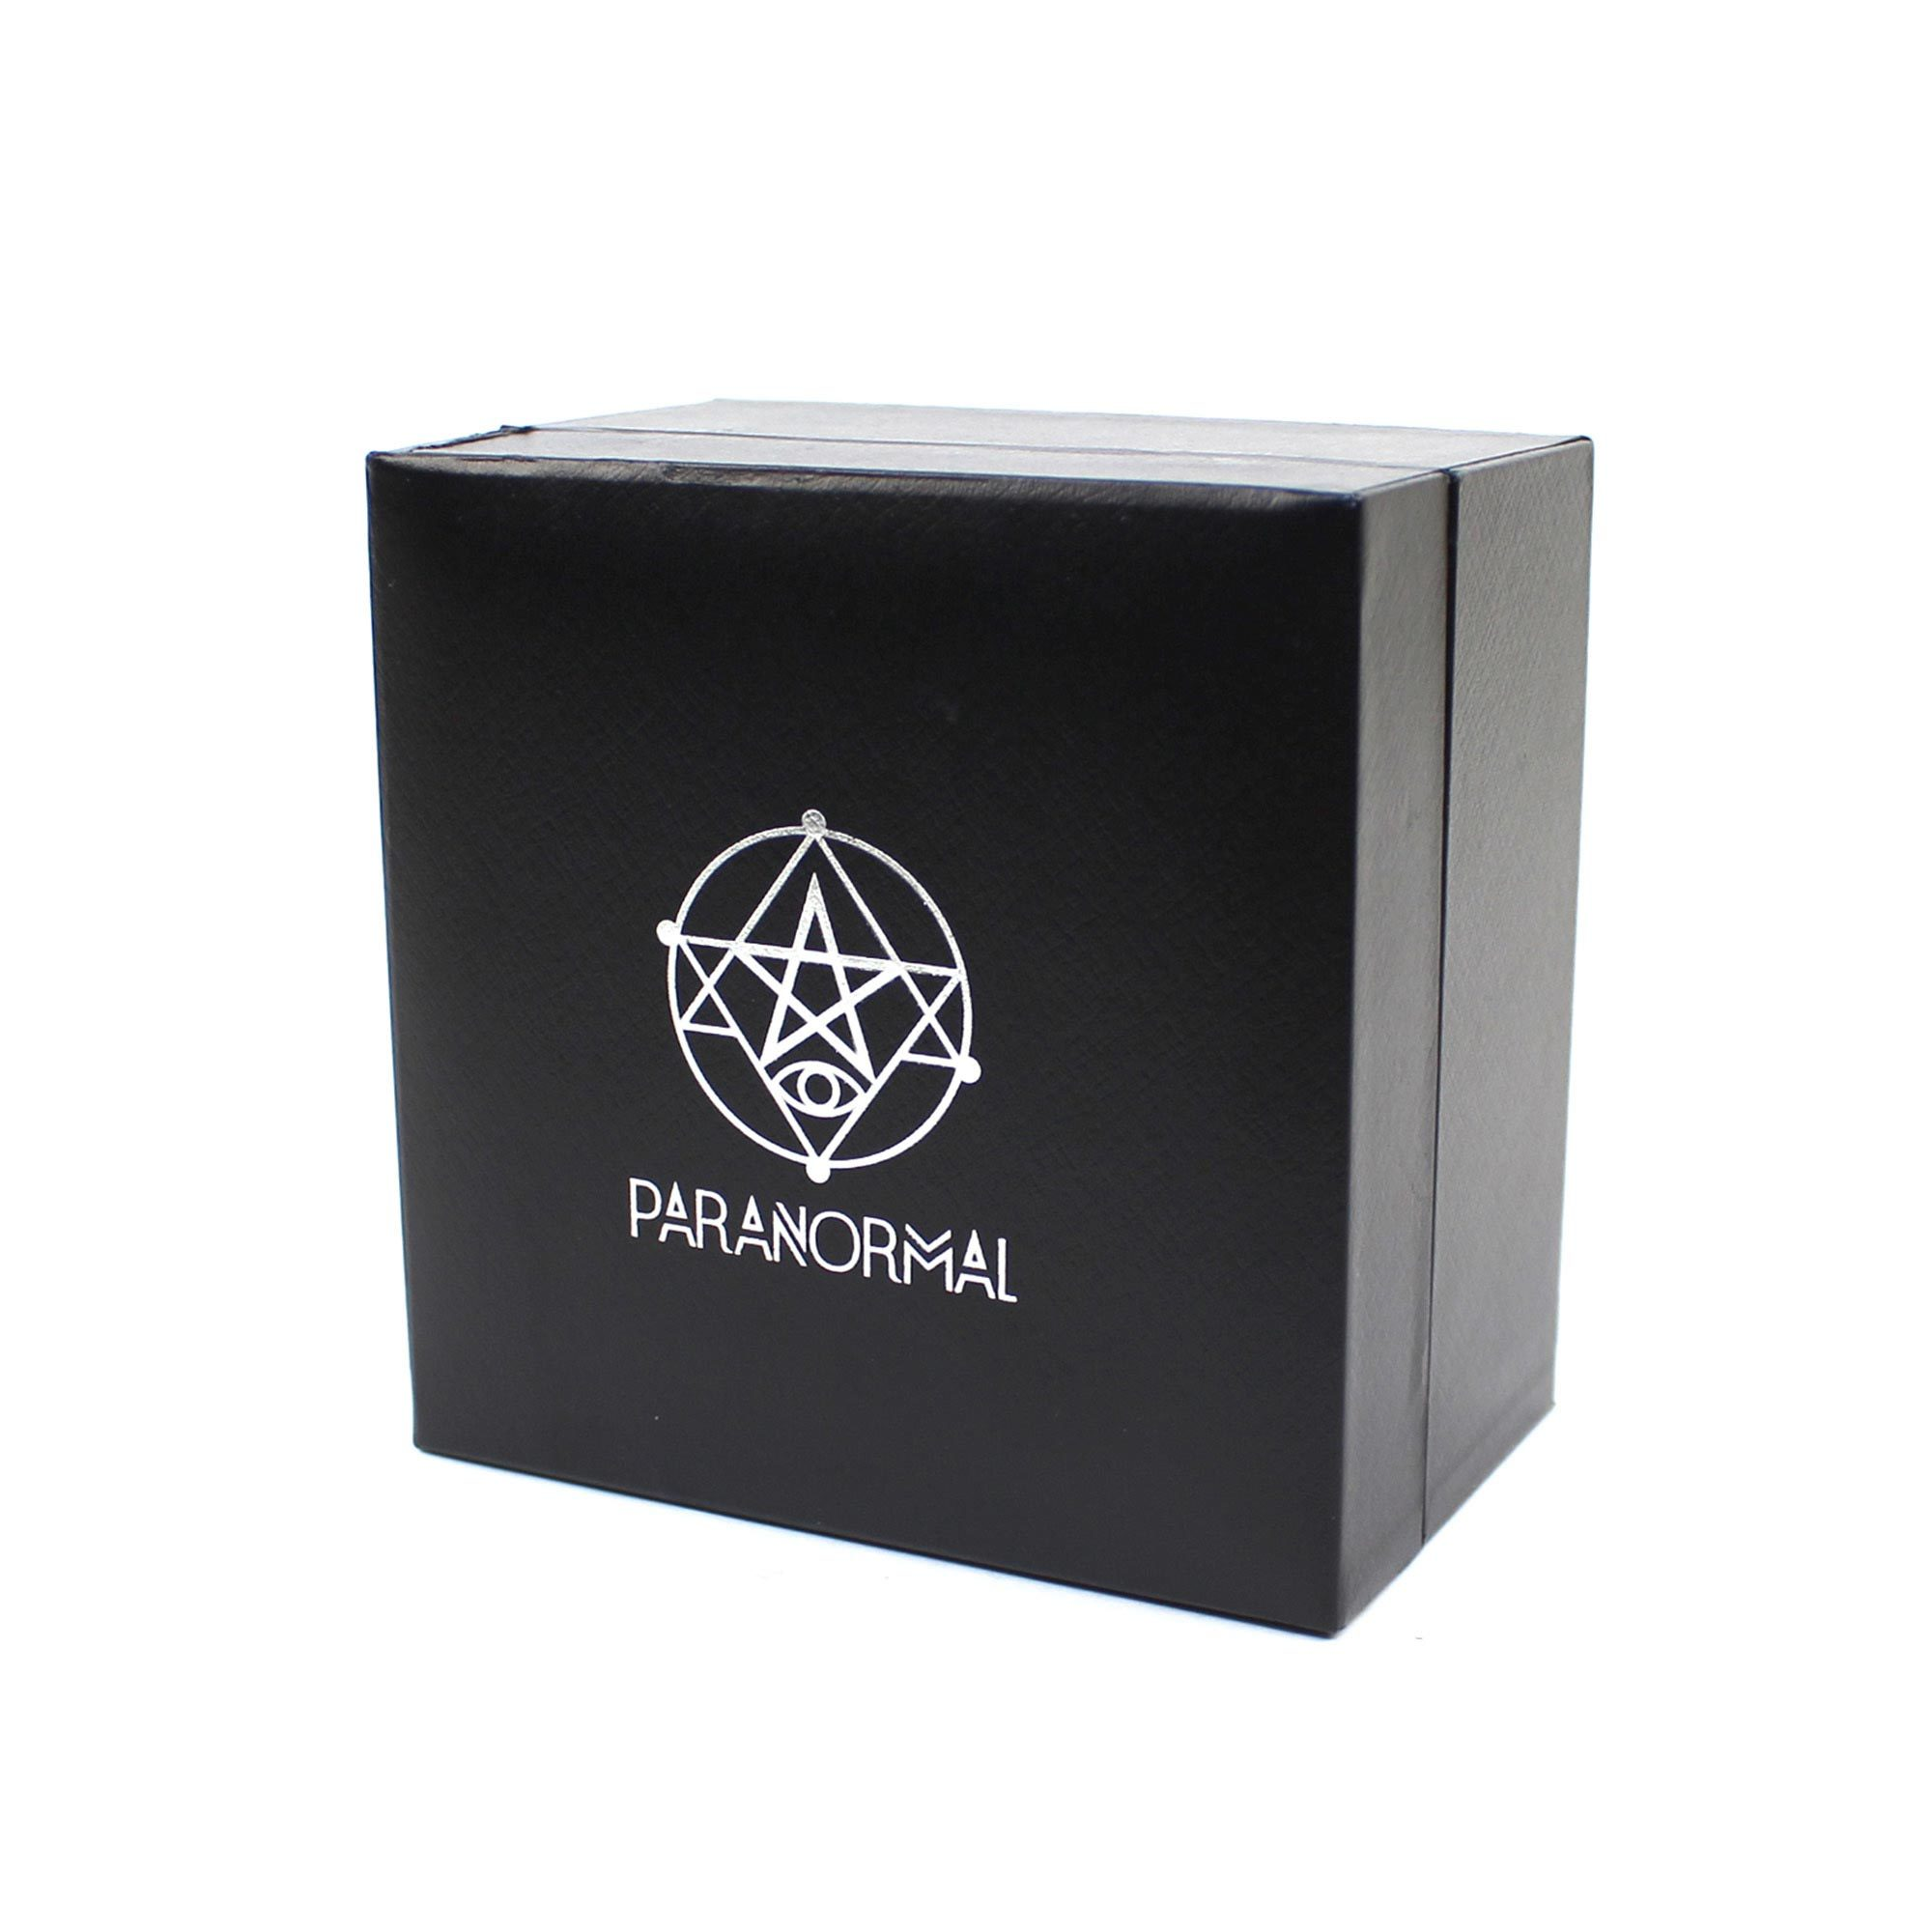 БОКСМОД Lost Vape Paranormal DNA 166 закрытая коробка